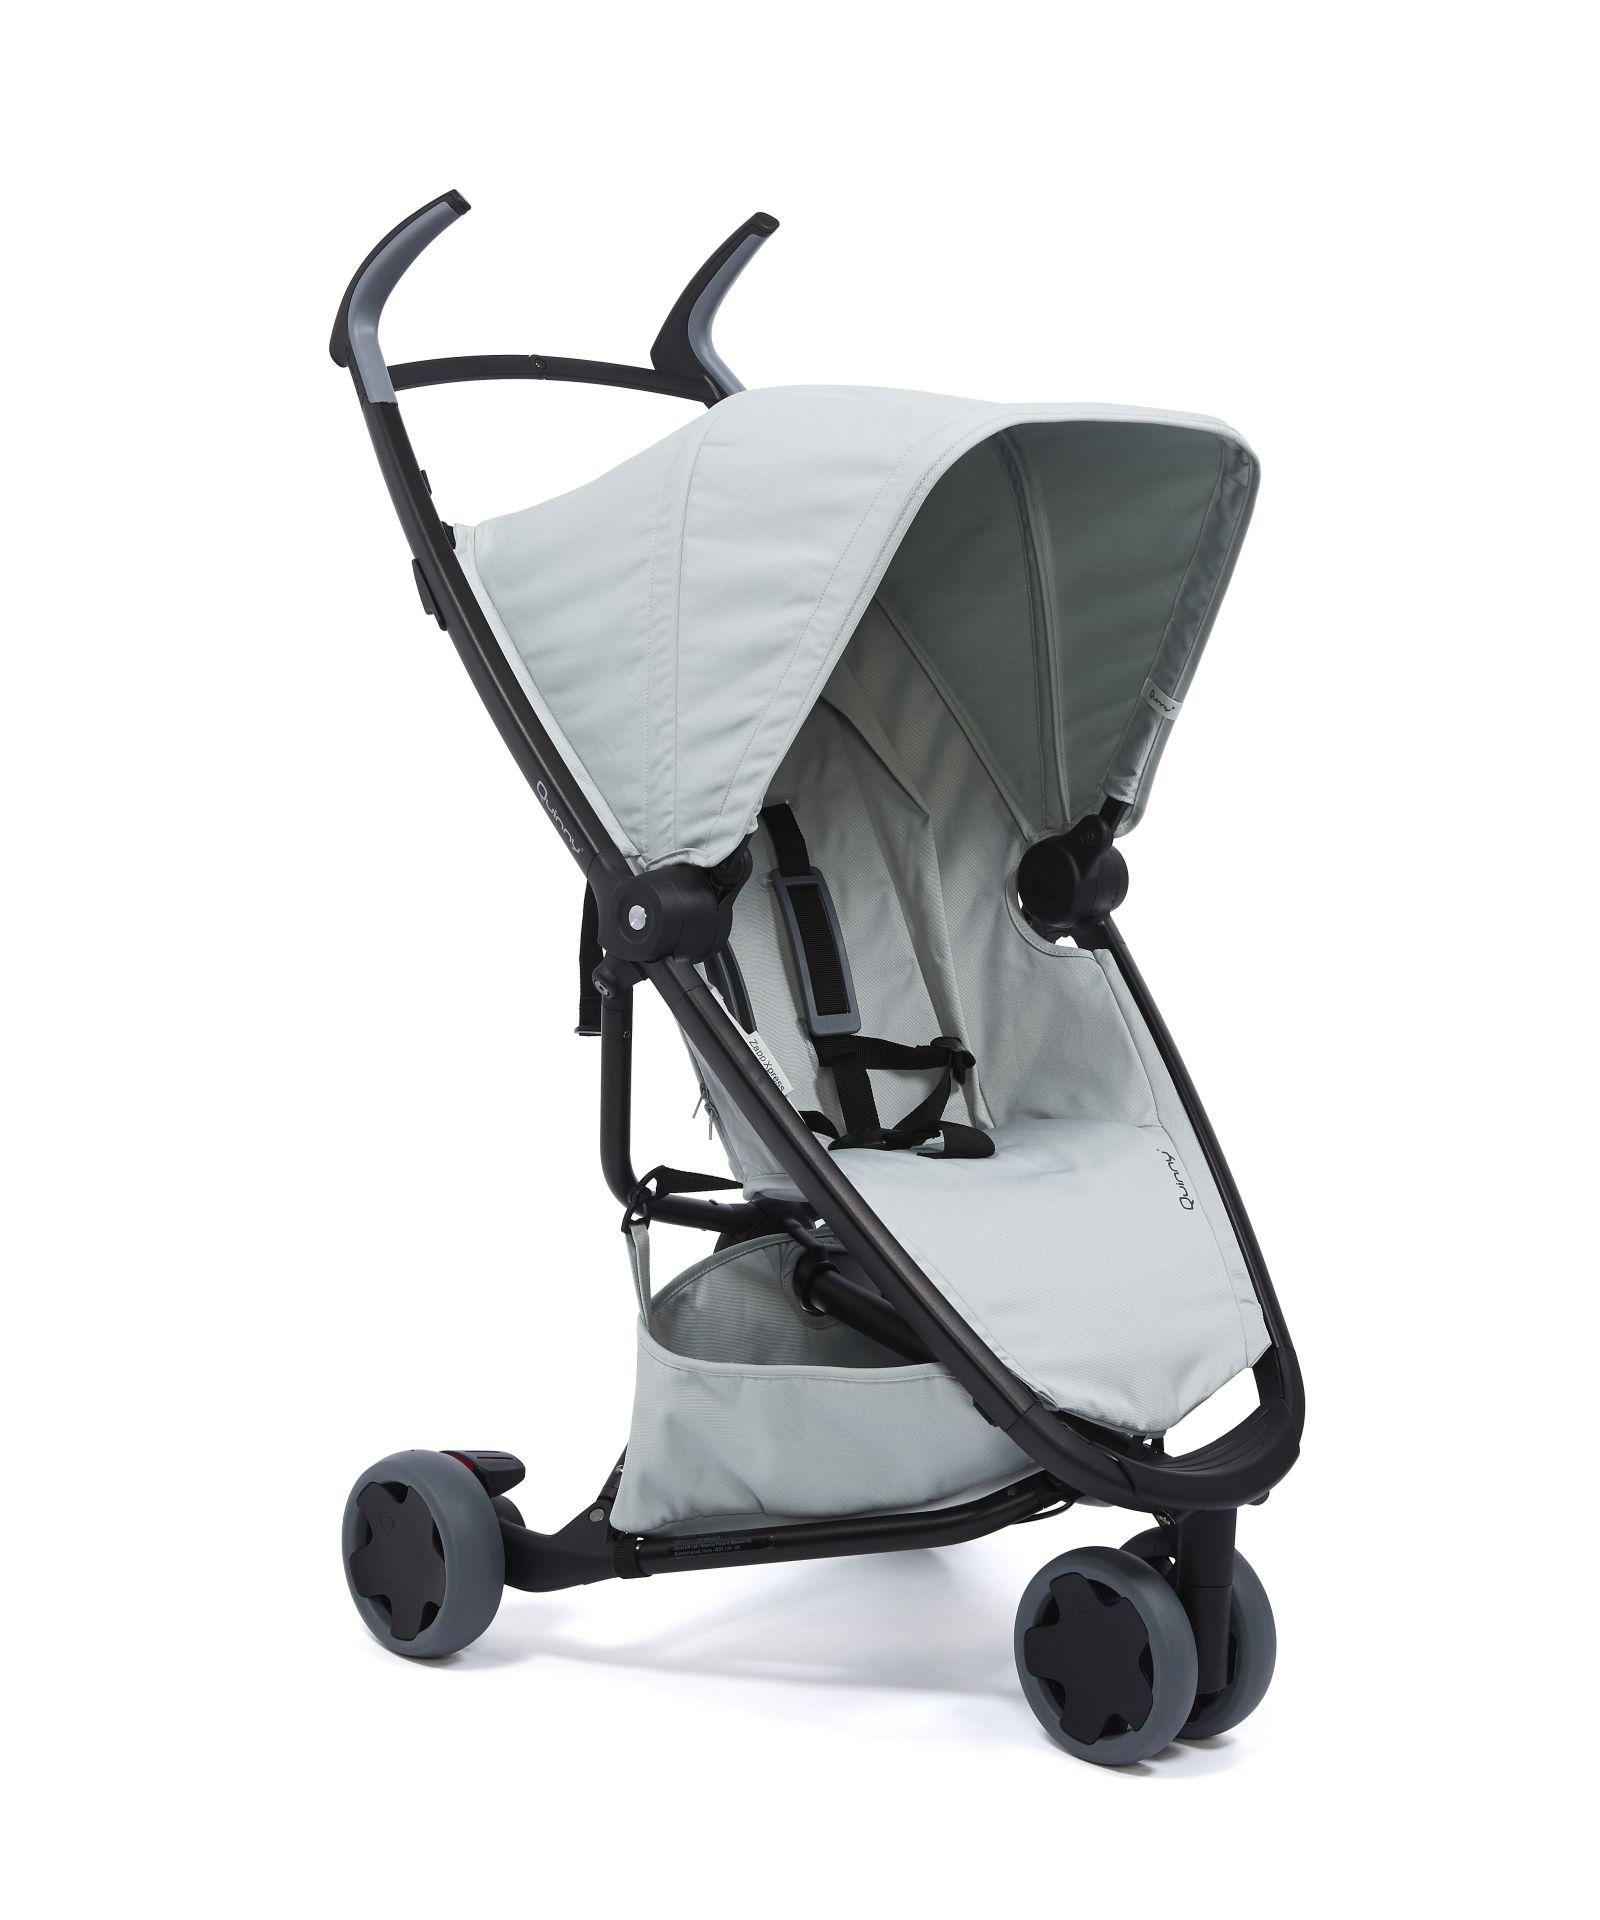 quinny buggy zapp xpress buy at kidsroom strollers. Black Bedroom Furniture Sets. Home Design Ideas